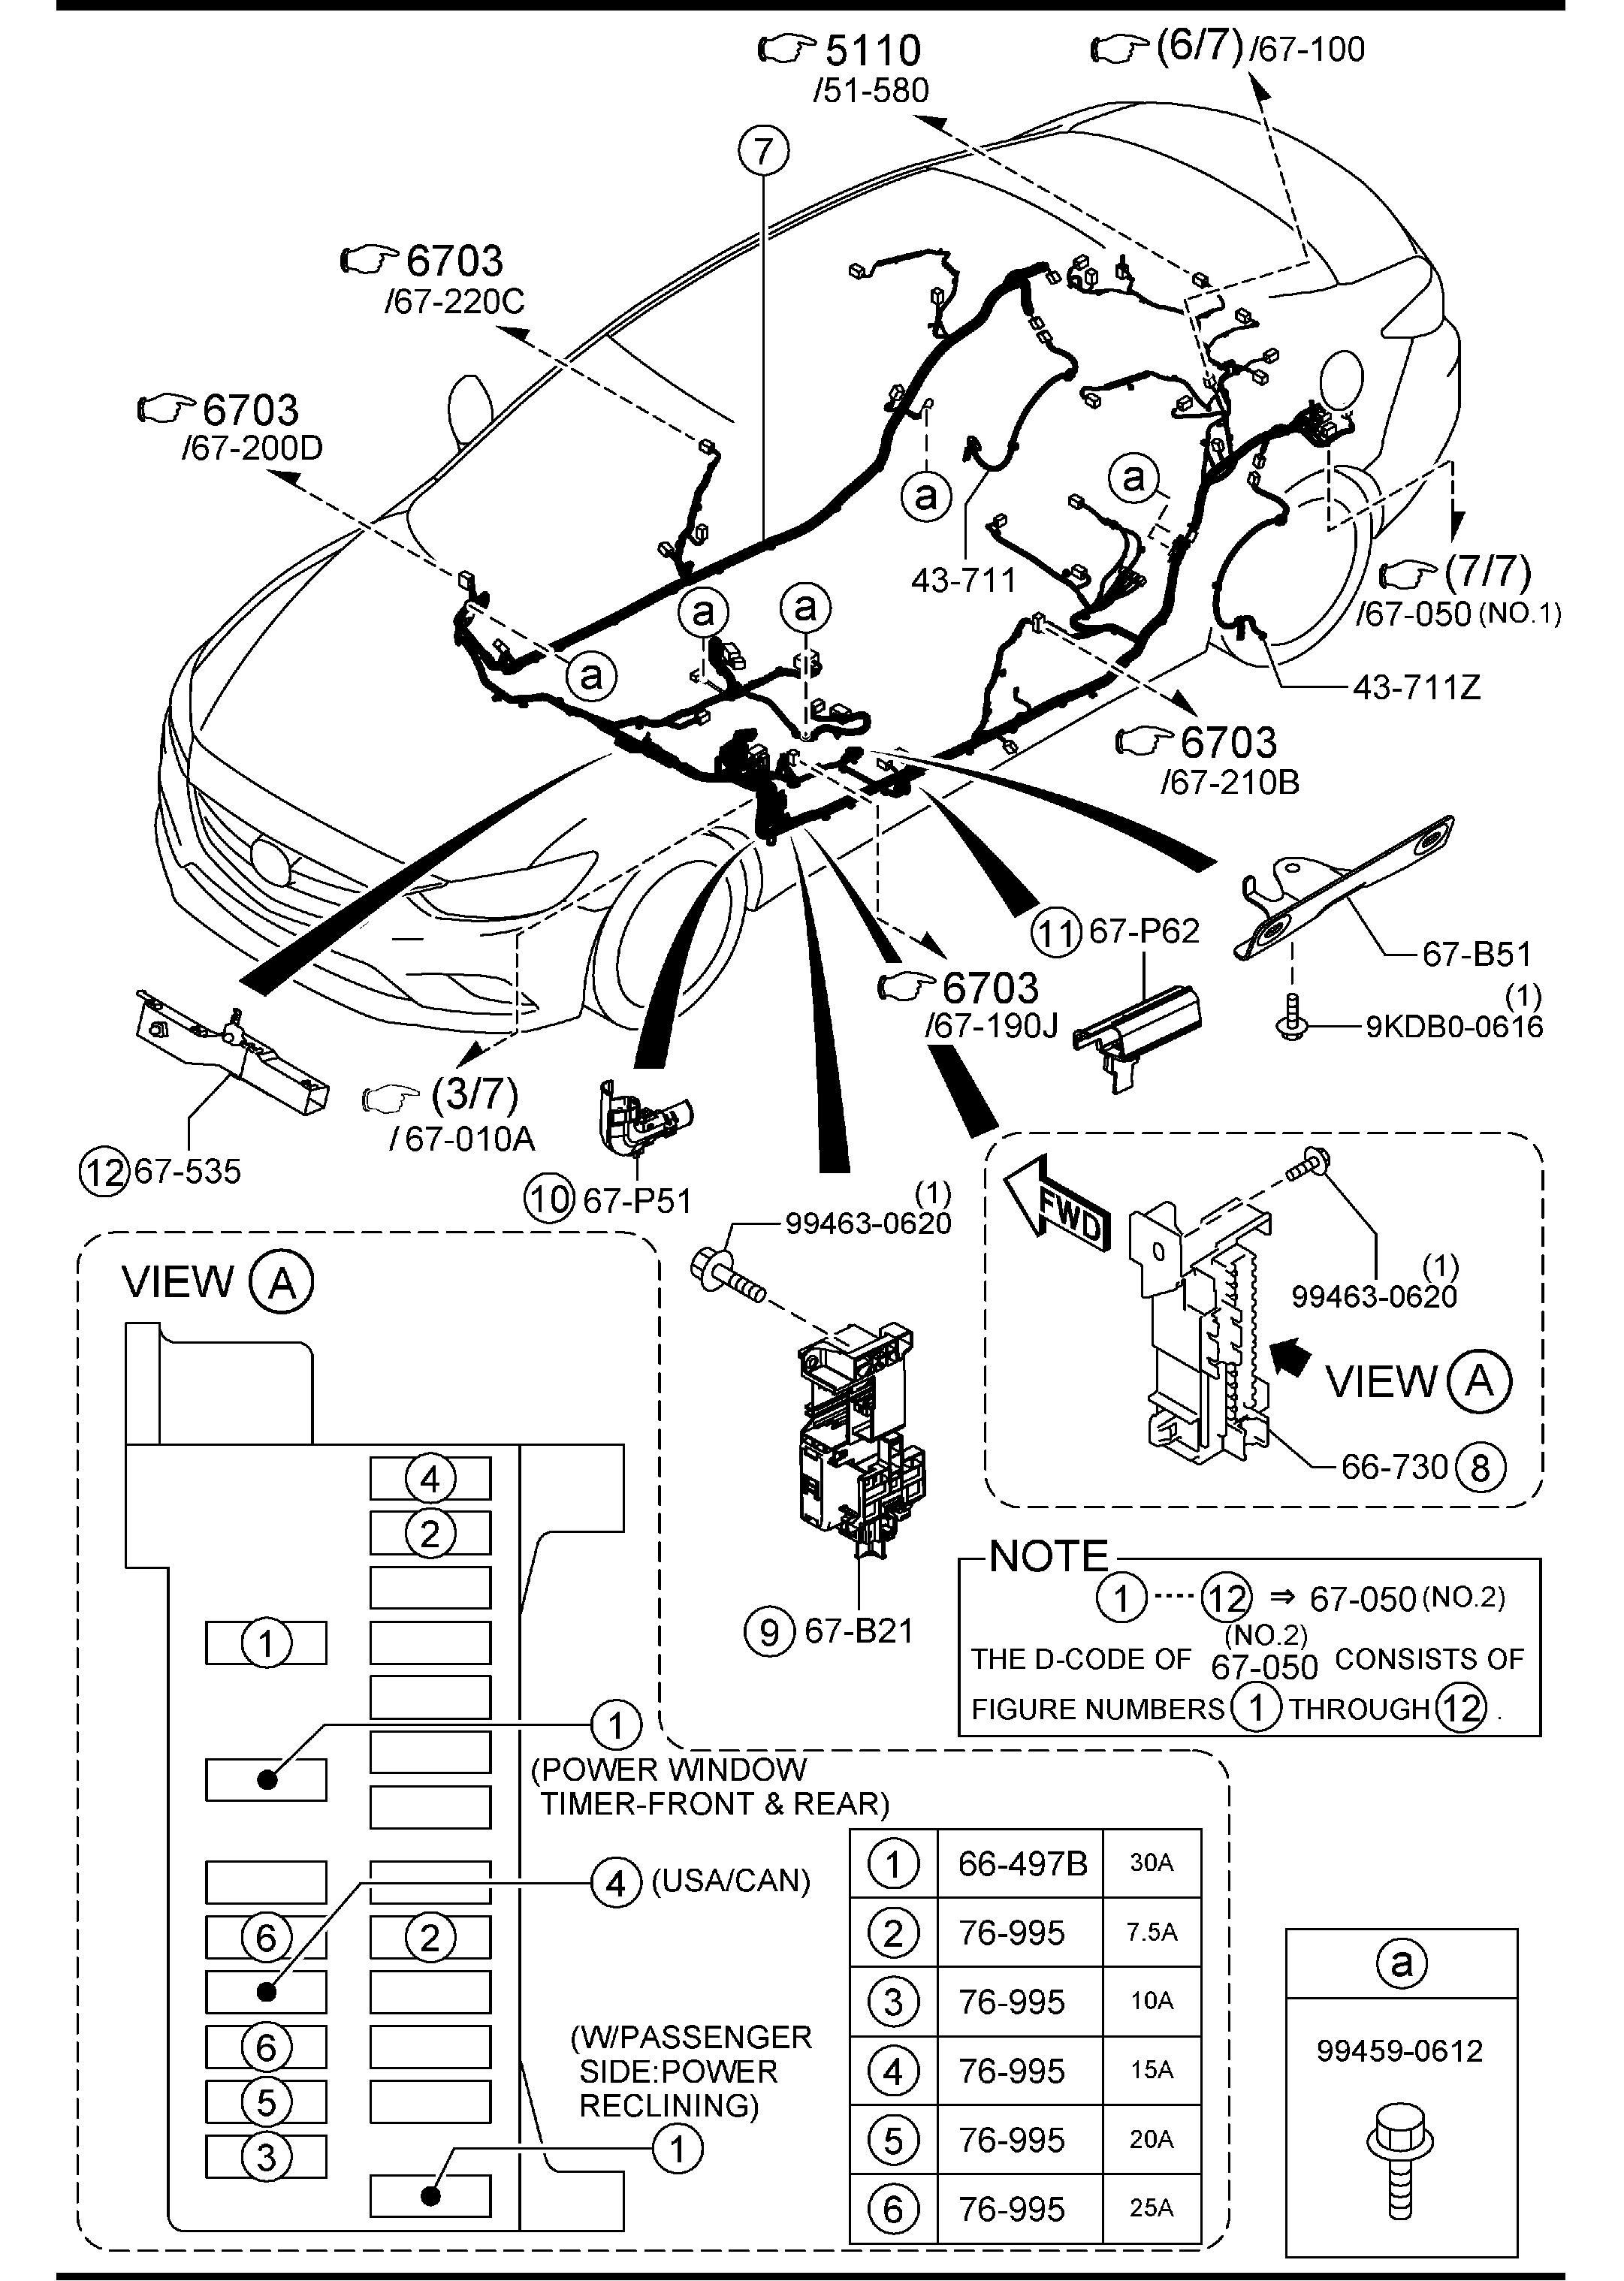 2011 ford f150 ecoboost fuse box diagram